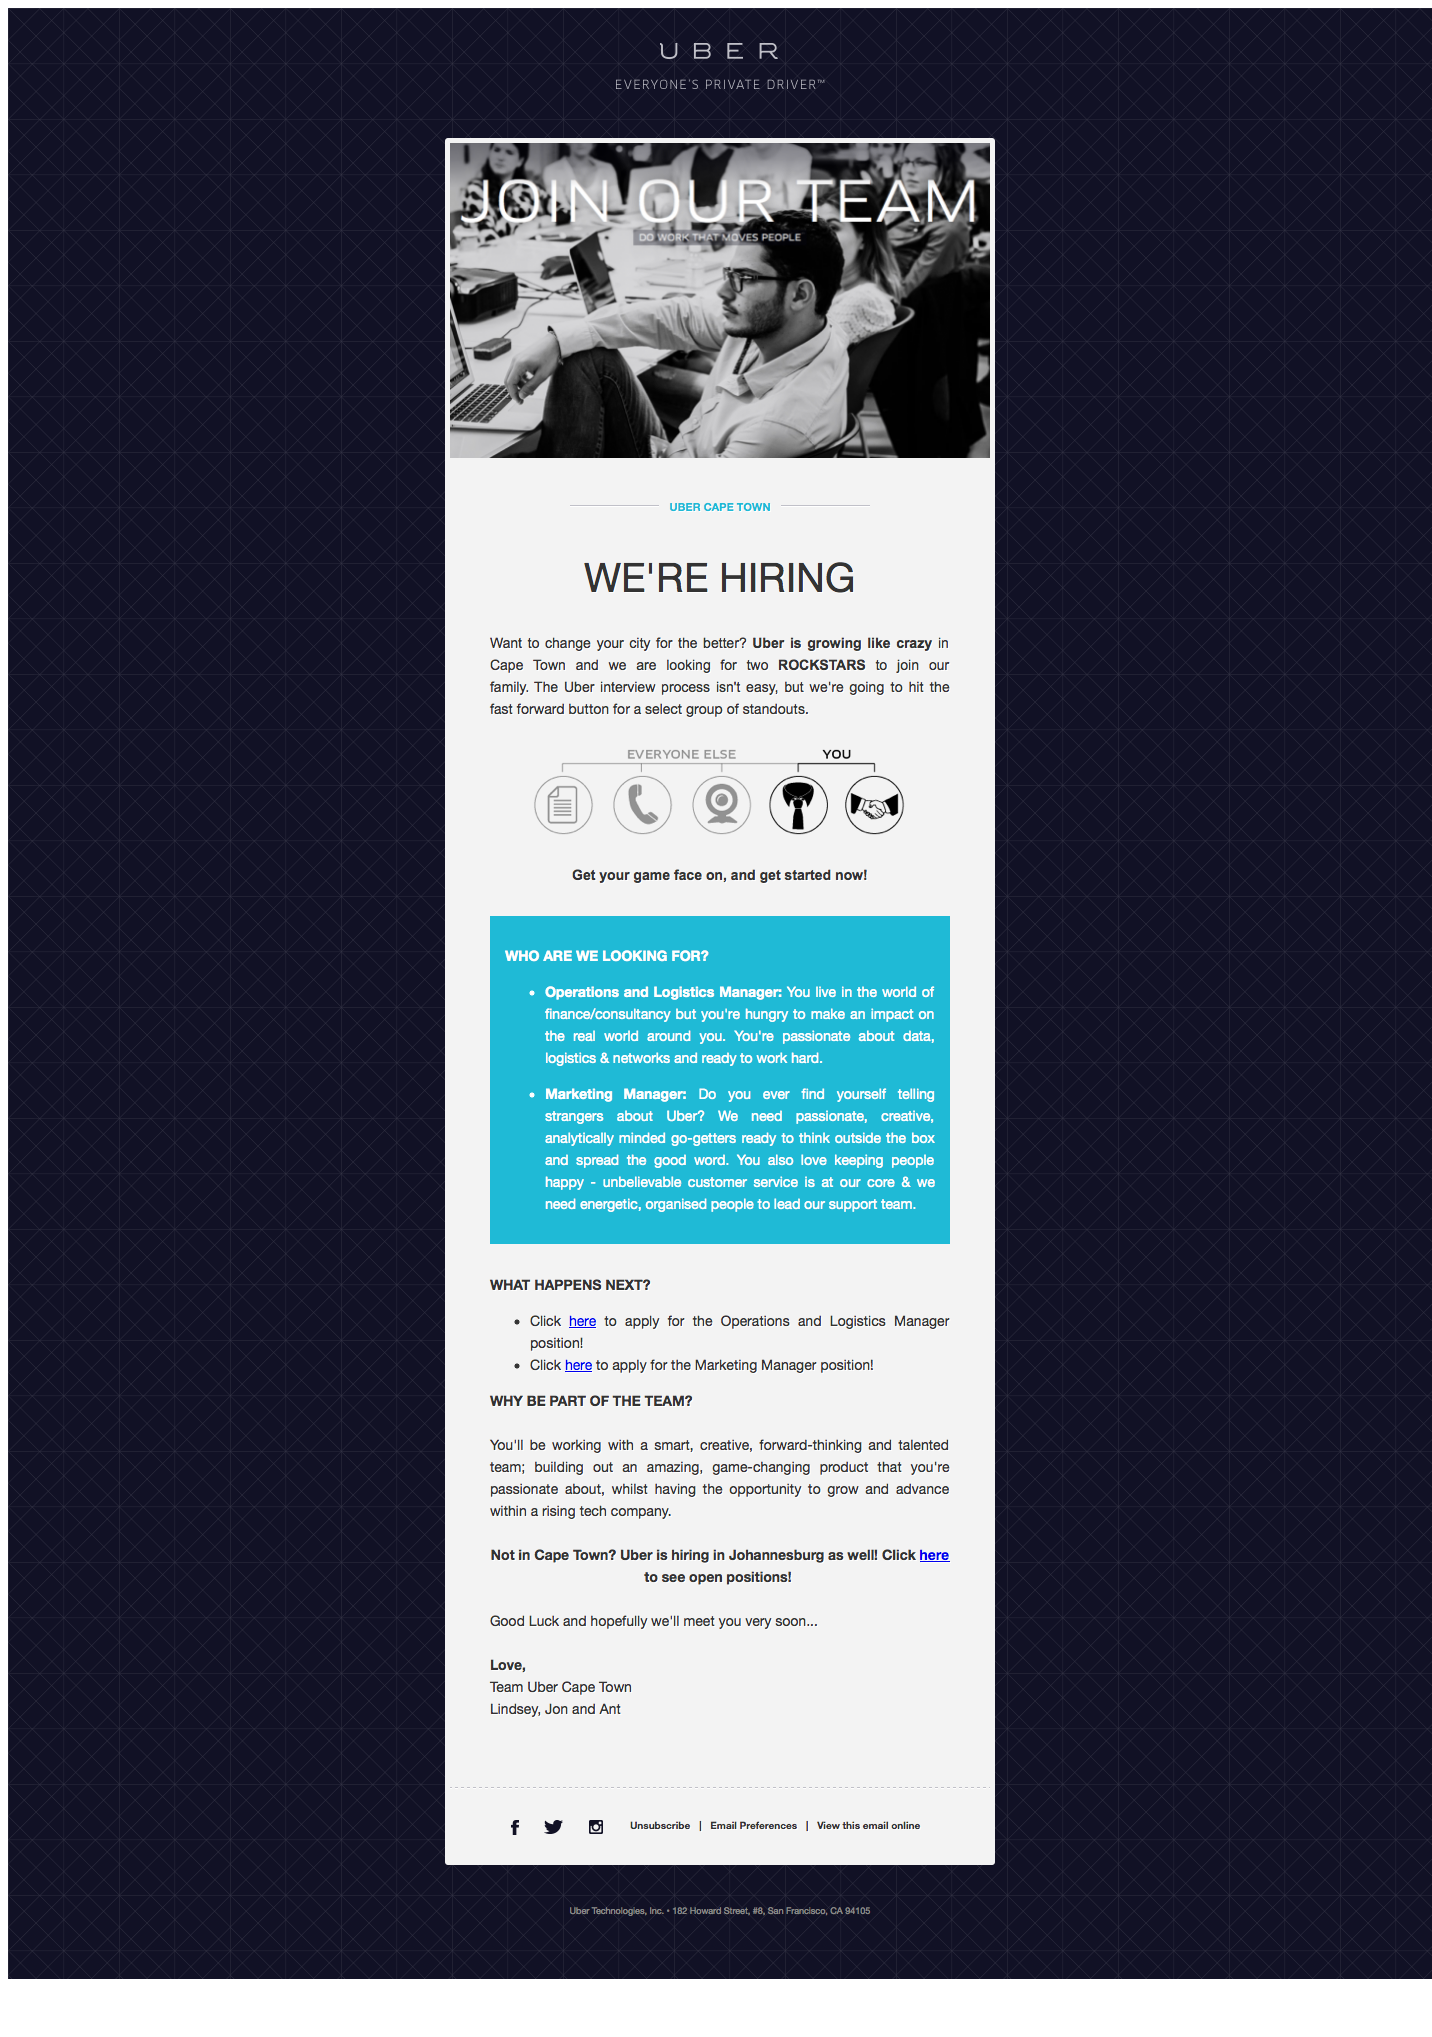 Email Marketing. Newsletter. Job offer email. #Uber ...